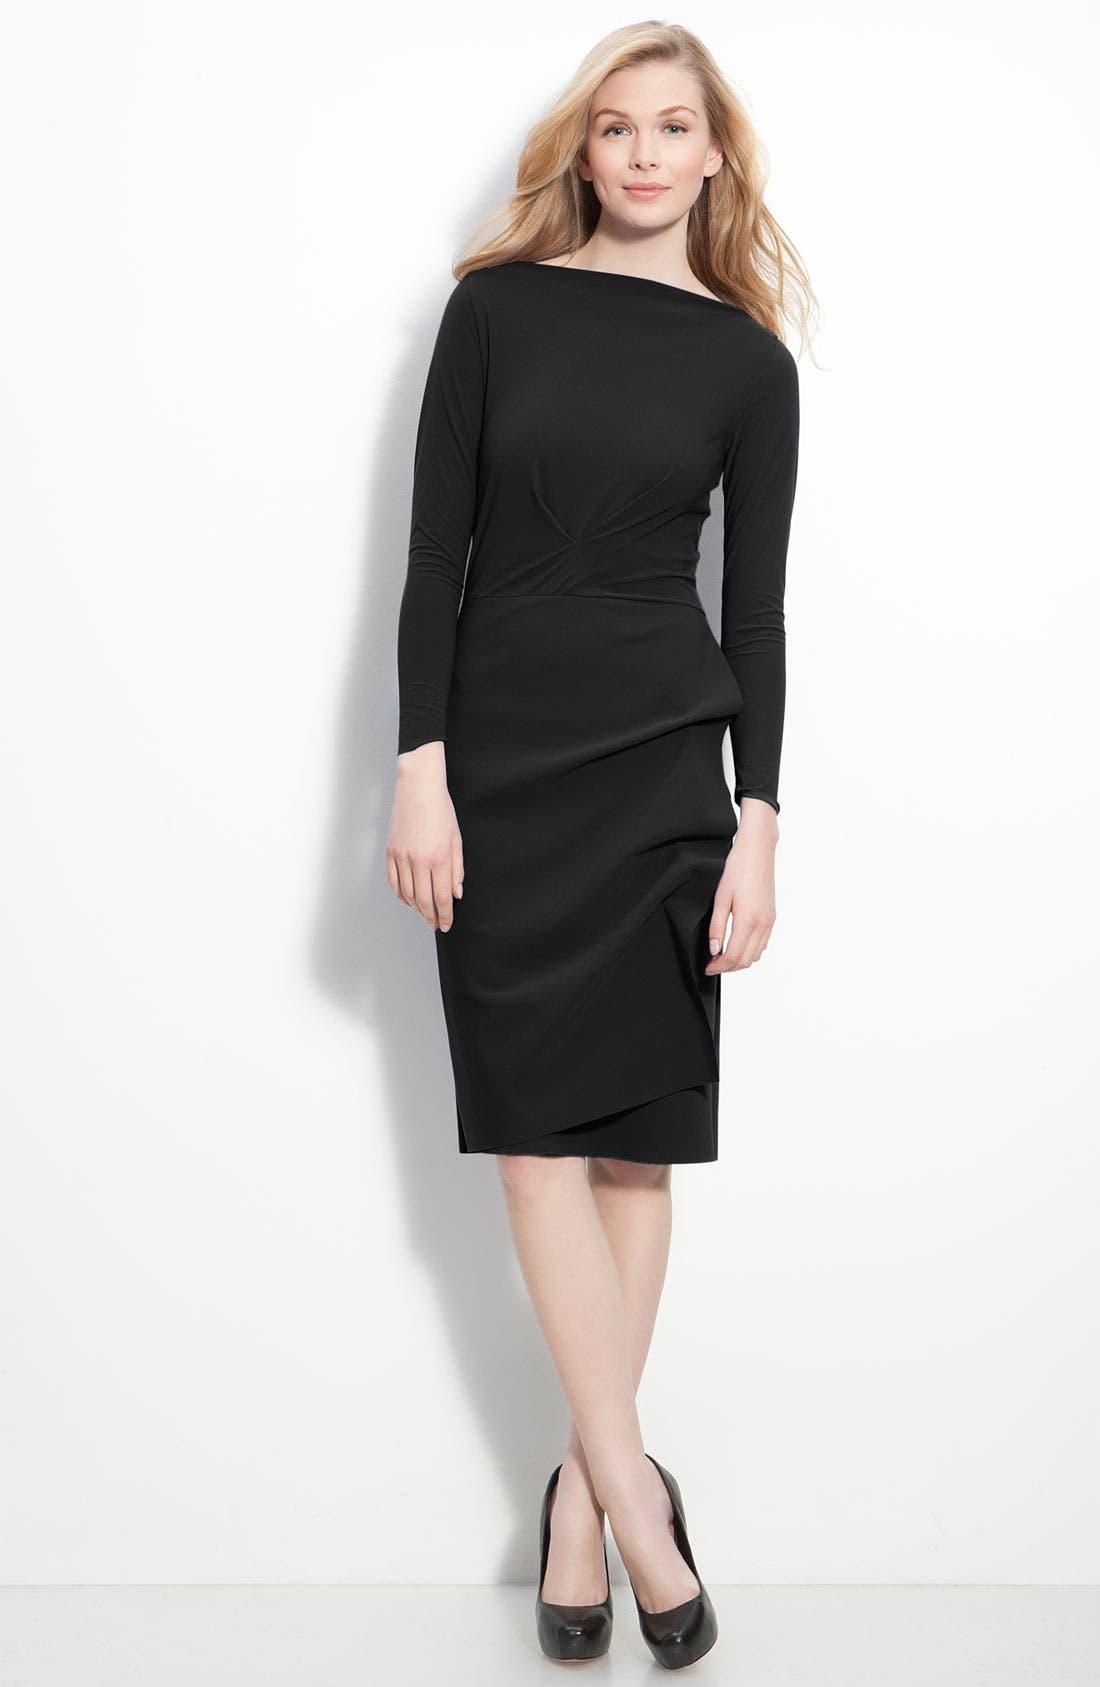 Main Image - La Petite Robe by Chiara Boni 'Cassandra' Dress